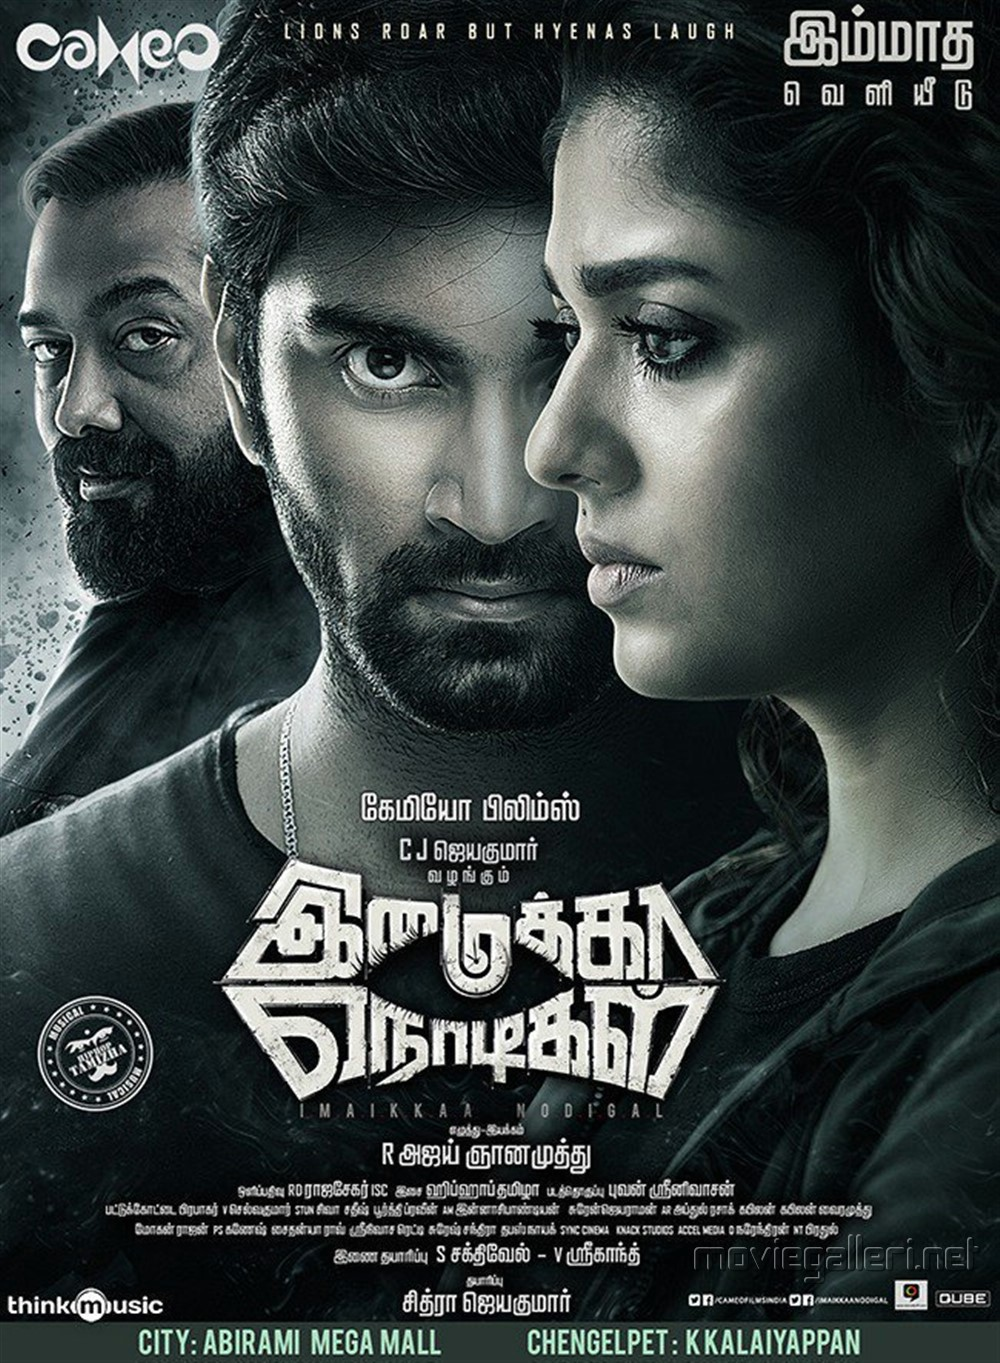 Anurag, Atharva, Nayanthara in Imaikka Nodigal Movie Release Posters